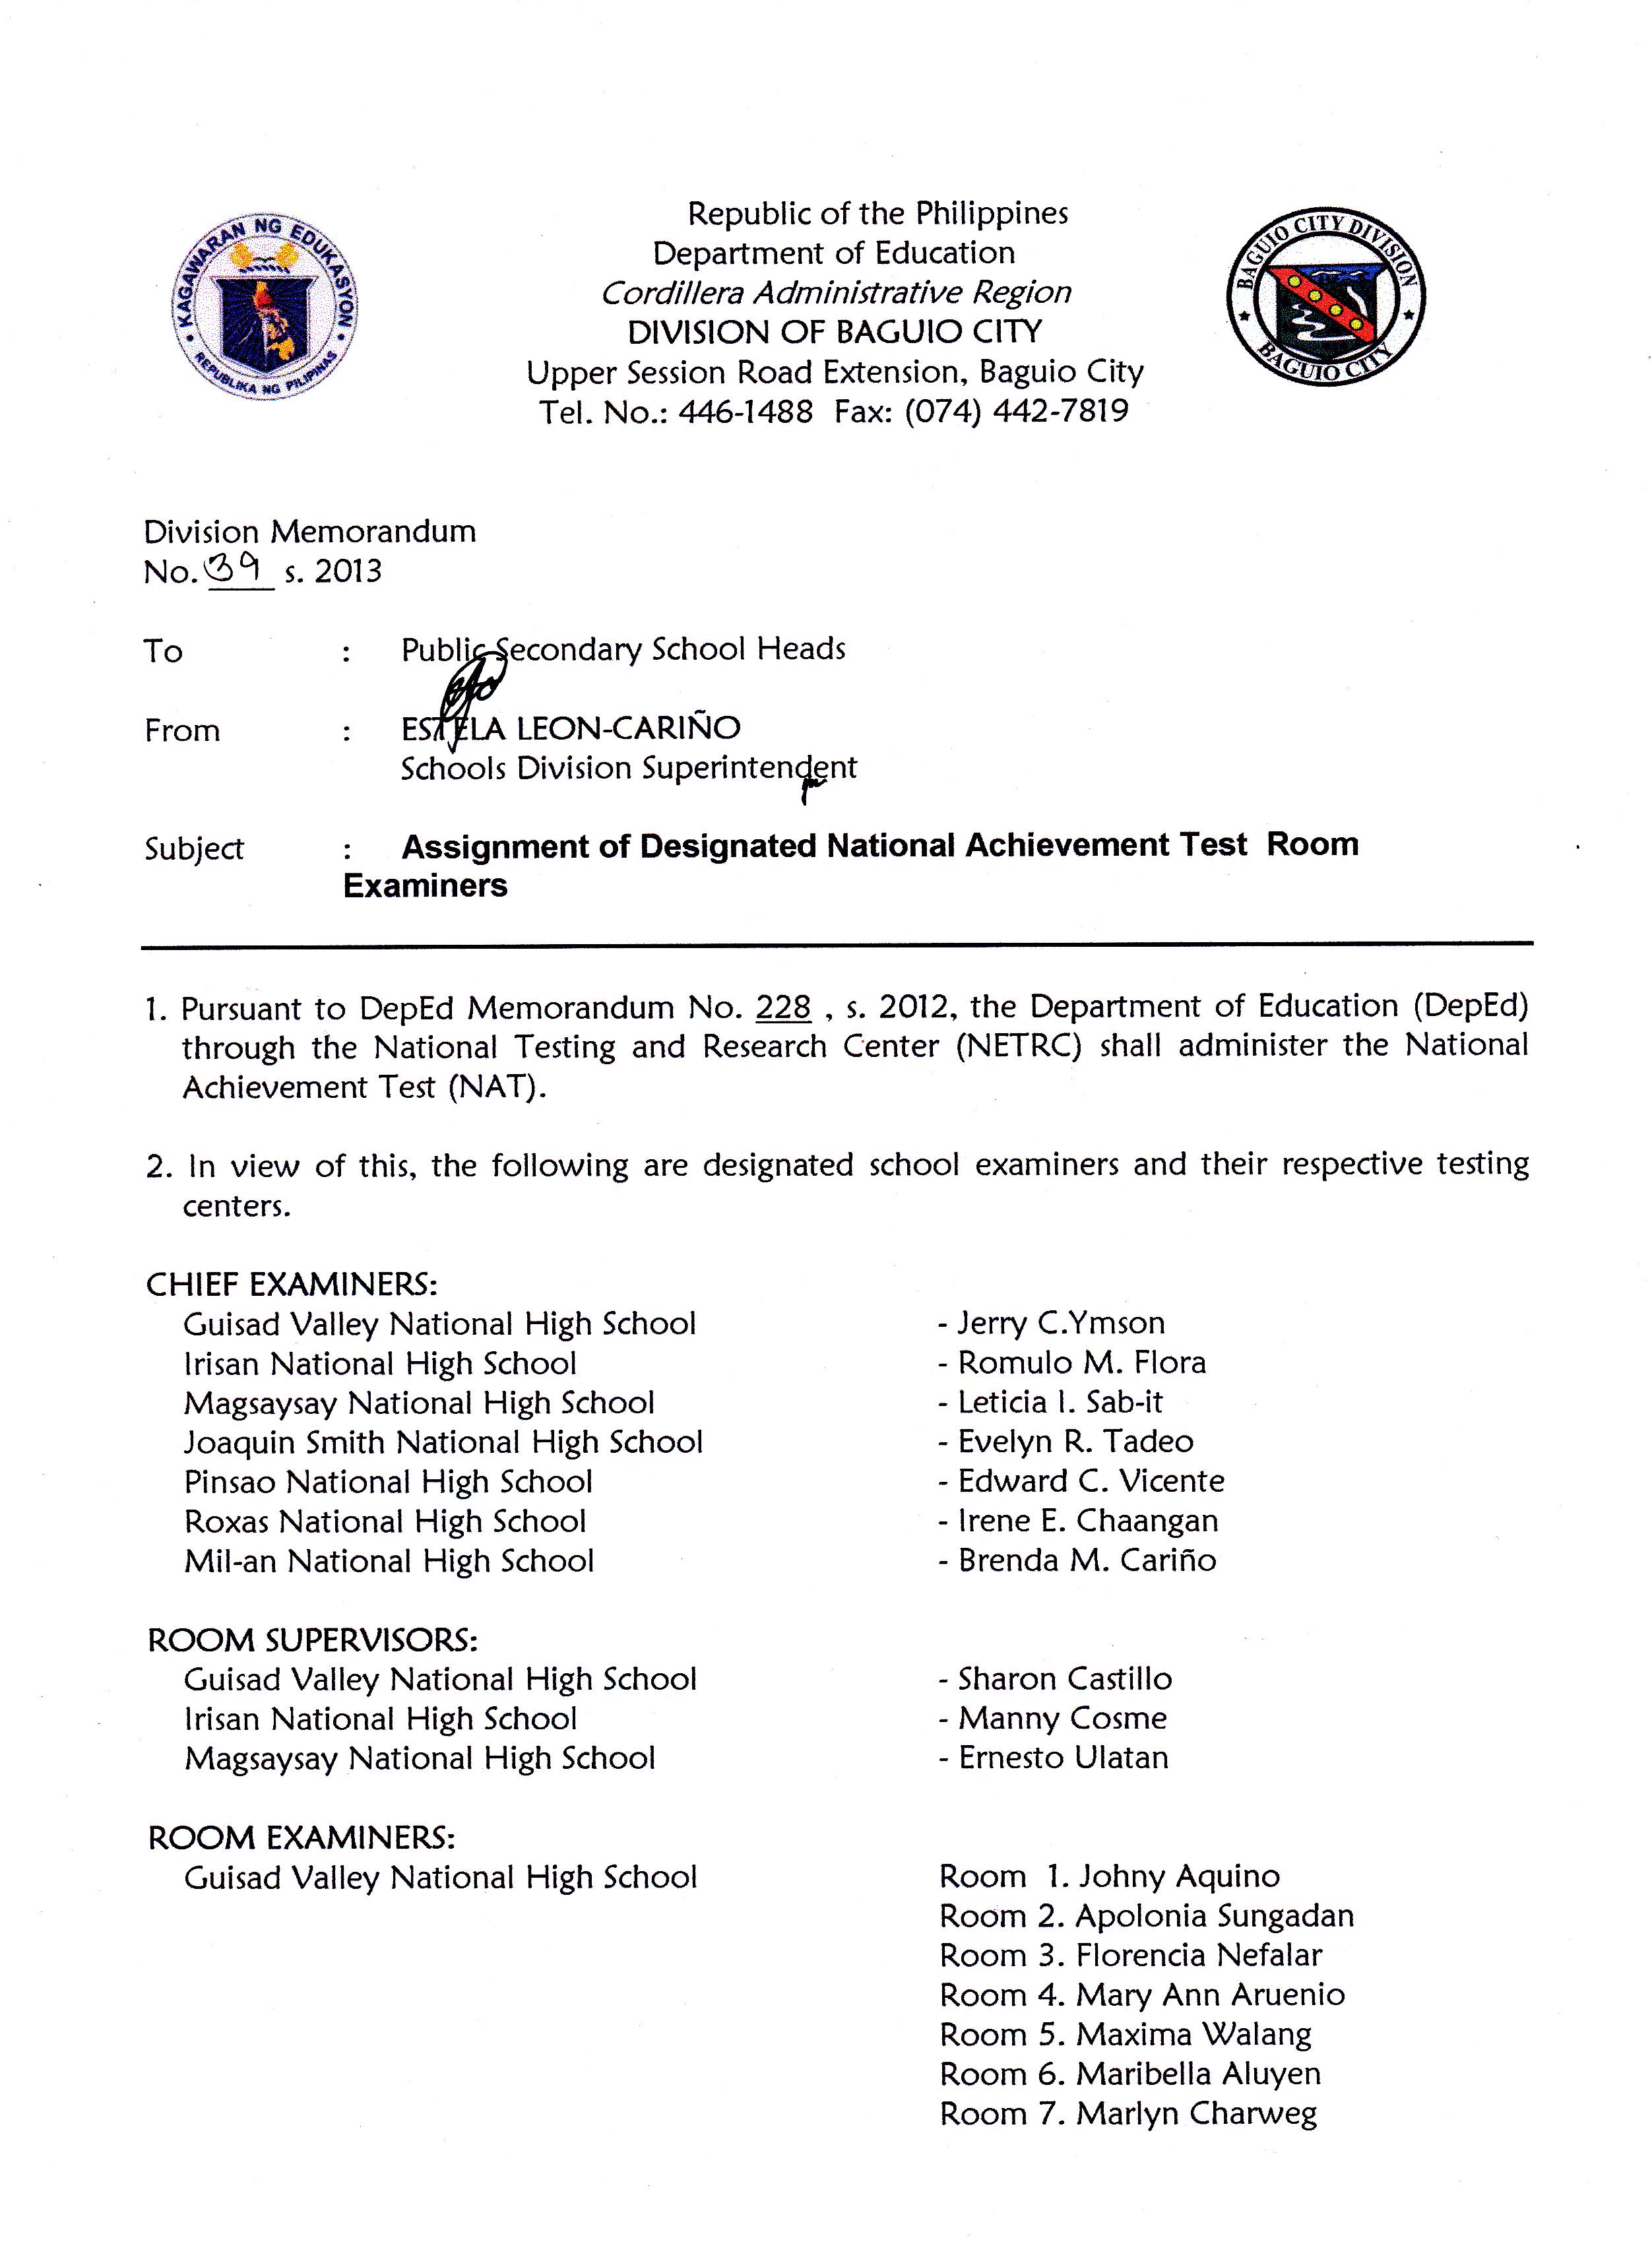 national achievement test 2014